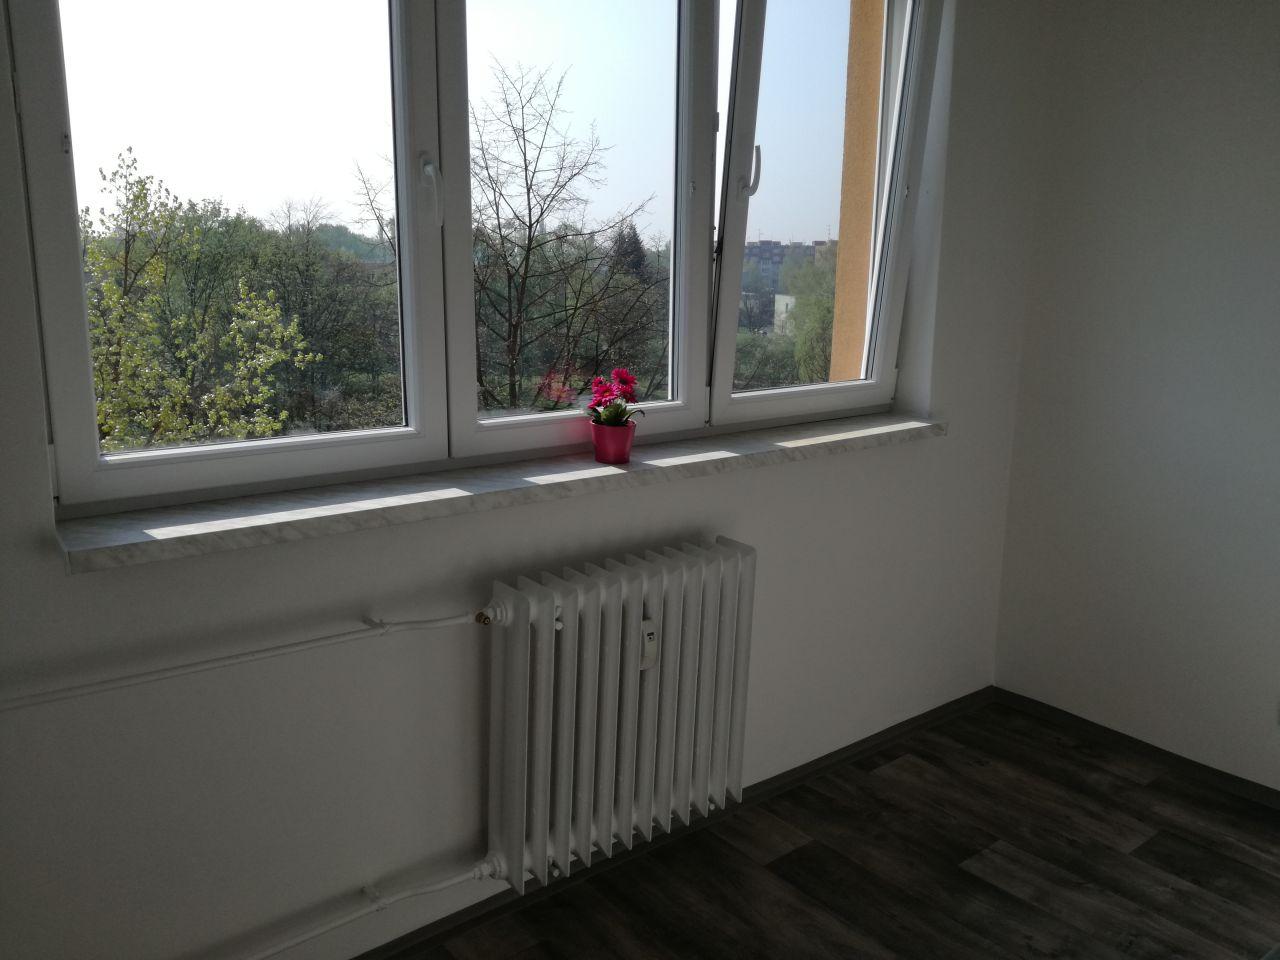 Pronájem bytu 2+1 49 m2, ul. Františka Hajdy 1232/14, Ostrava - Hrabůvka